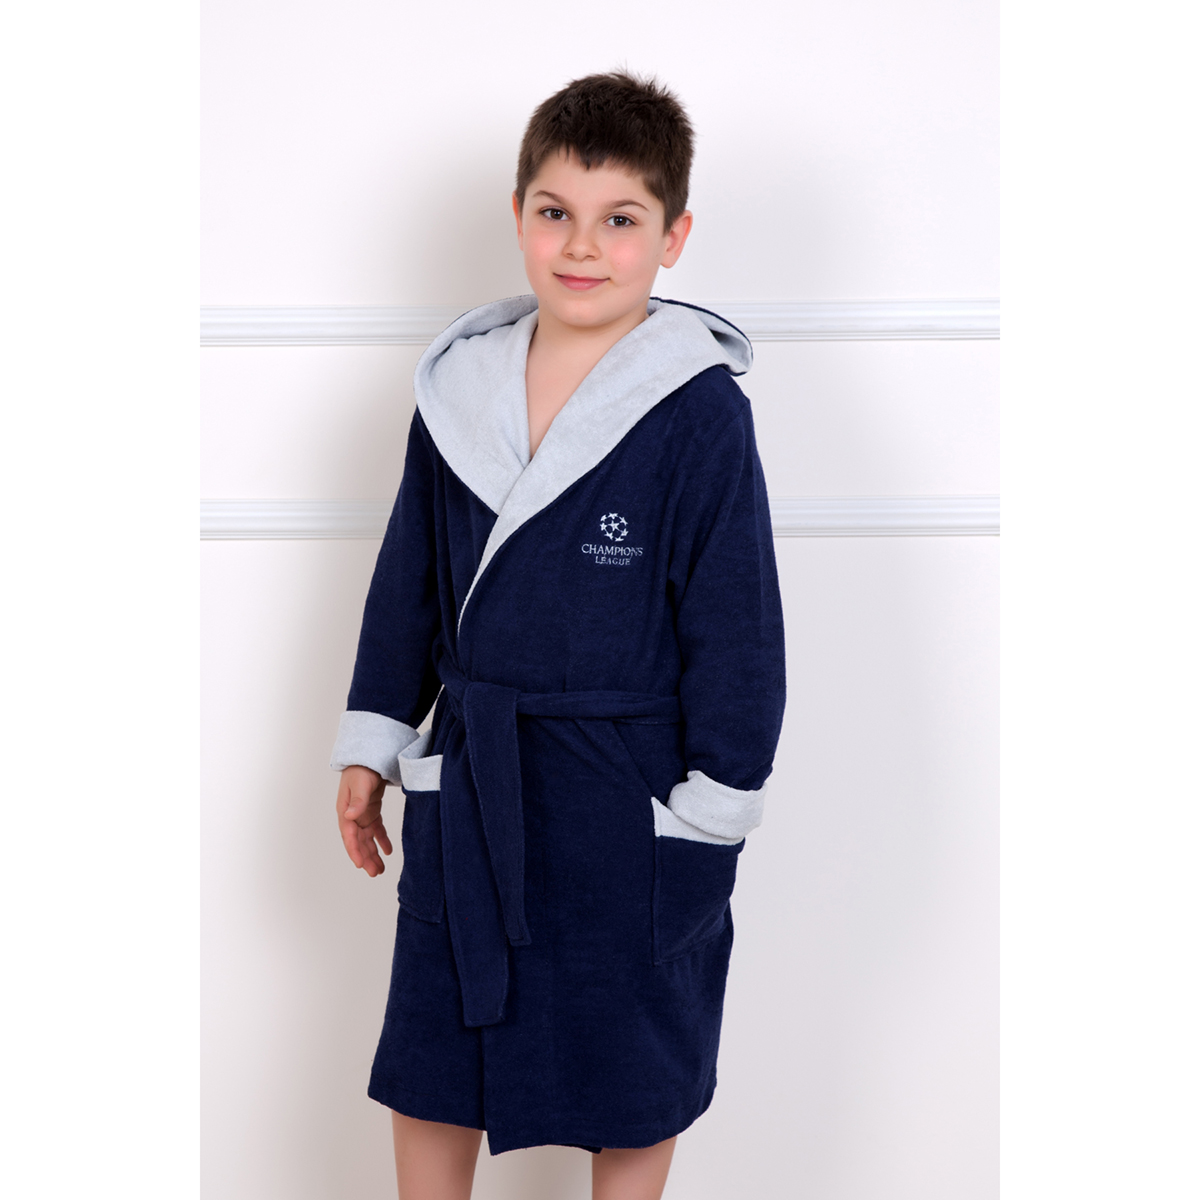 Детский халат Чемпион Синий, размер 8 летХалаты<br><br><br>Тип: Дет. халат<br>Размер: 8 лет<br>Материал: Махра